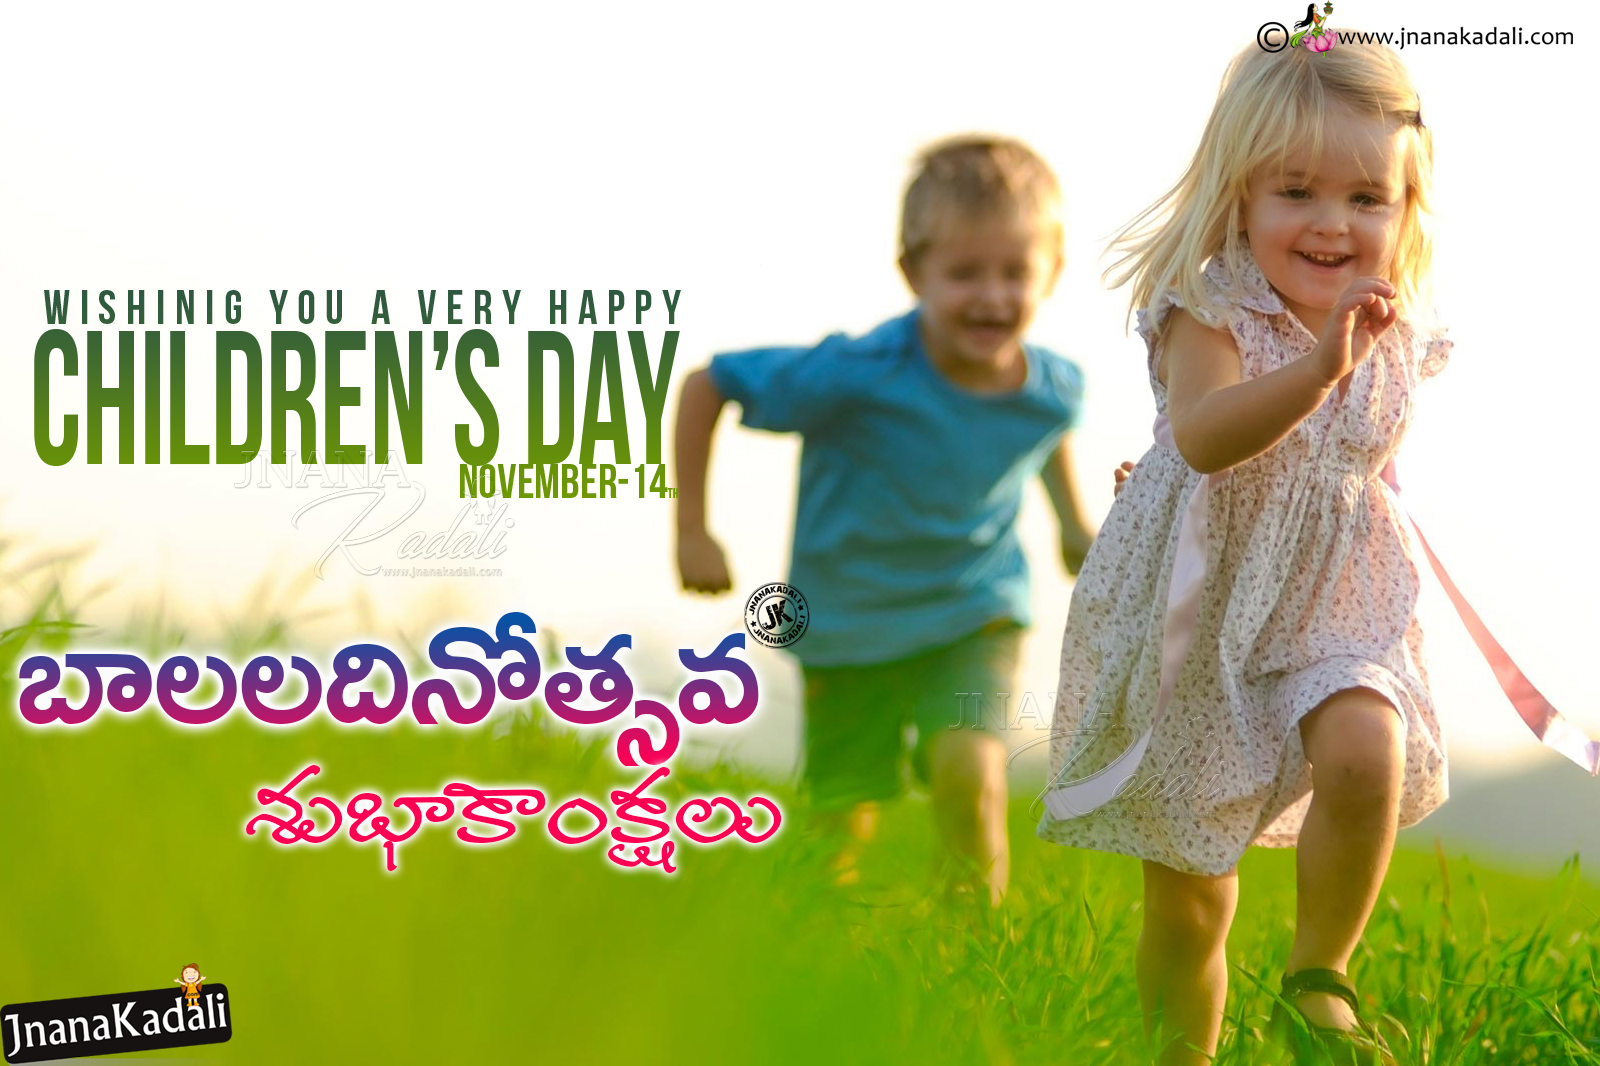 telugu happy children s day greetings quotes hd sunlight